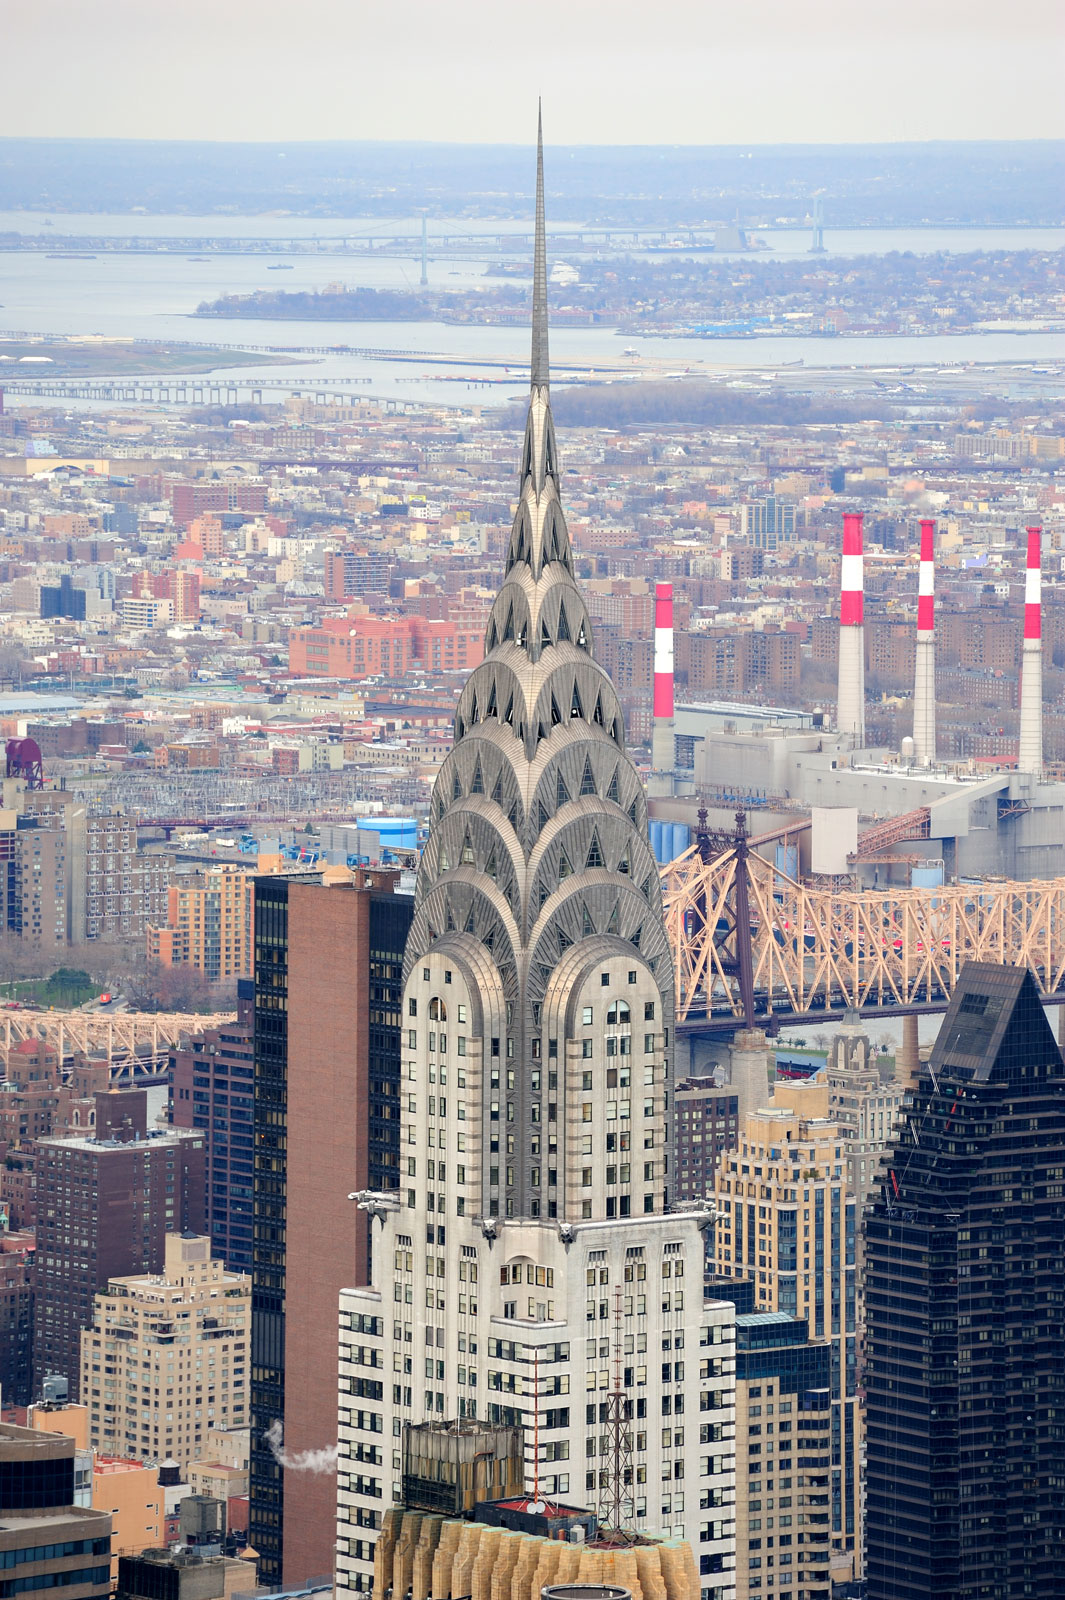 Chrysler Building   Image source: Britannica.com